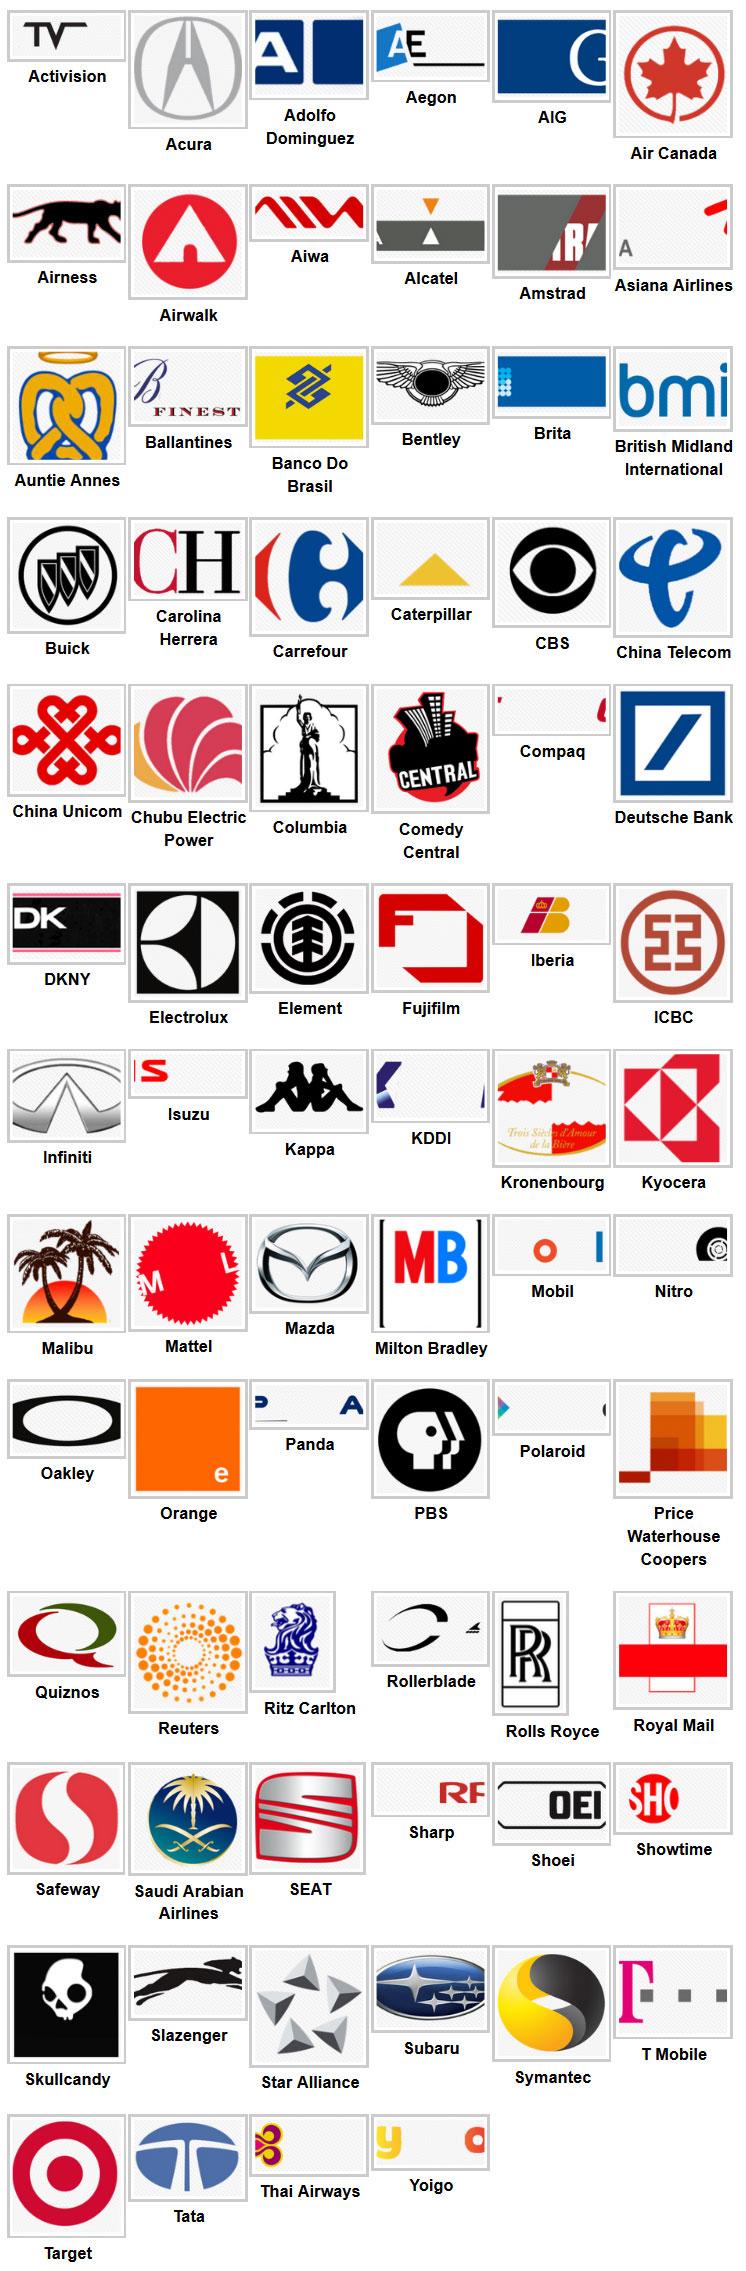 100 Pics Football Logos Level 71-80 Answers]